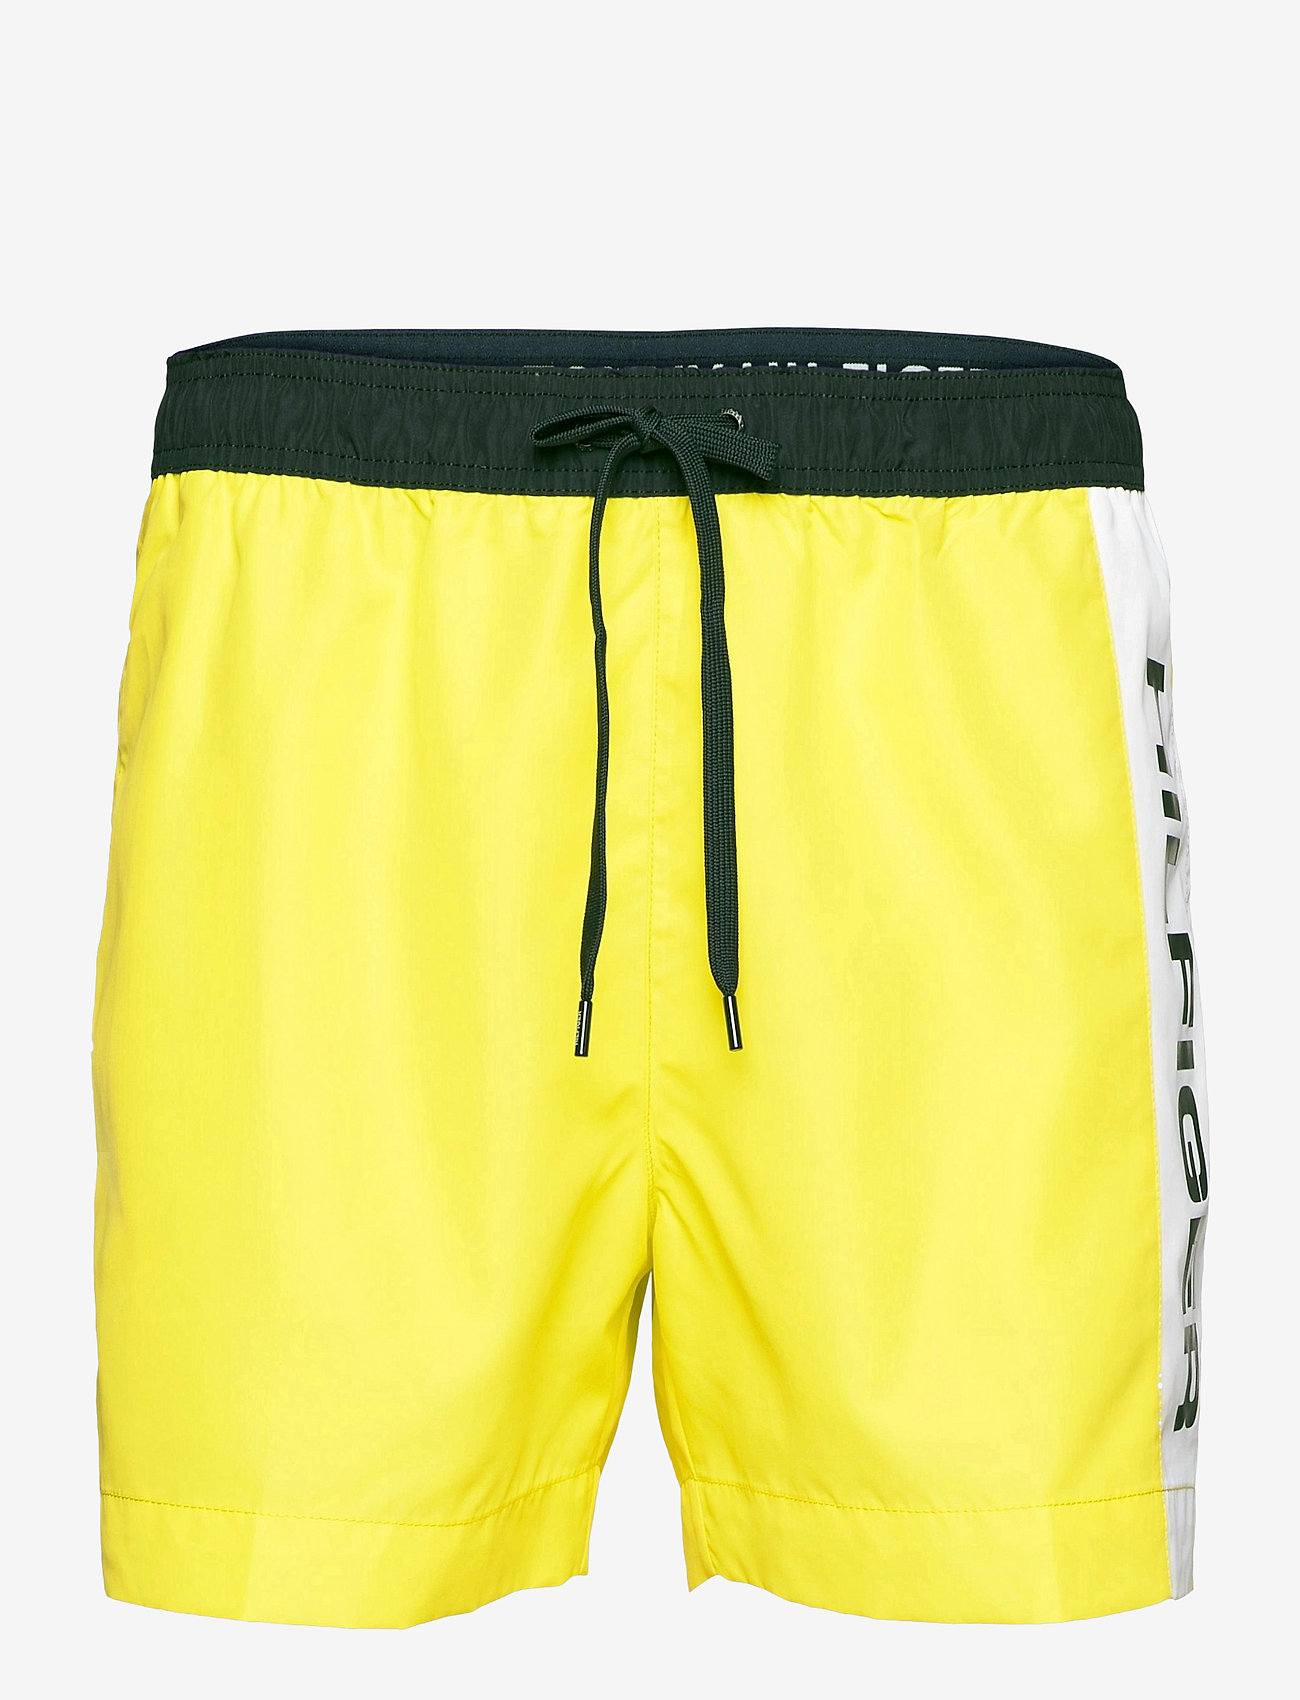 Tommy Hilfiger - MEDIUM DRAWSTRING - casual shorts - th neon yellow - 0